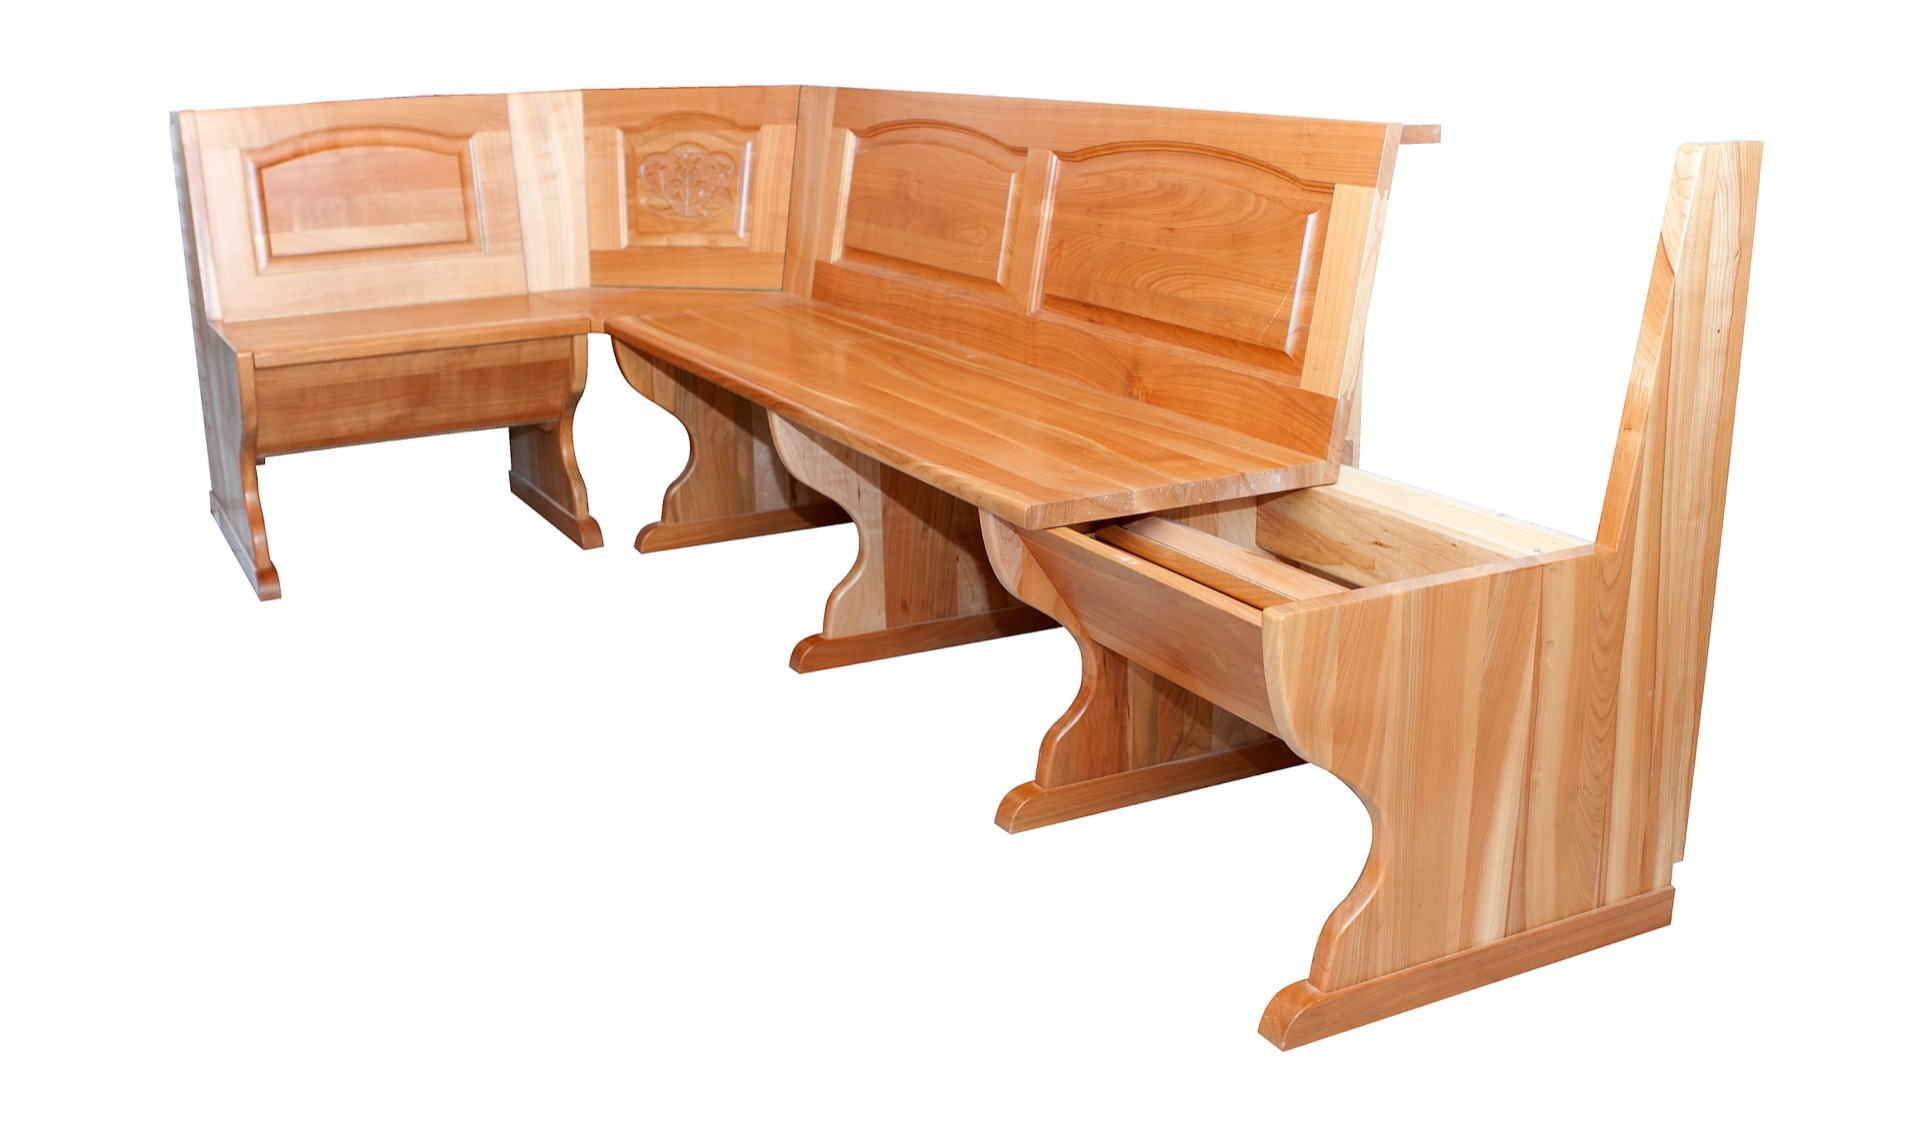 Eckbank Holz | Wir fertigen Ihre Eckbank aus Holz